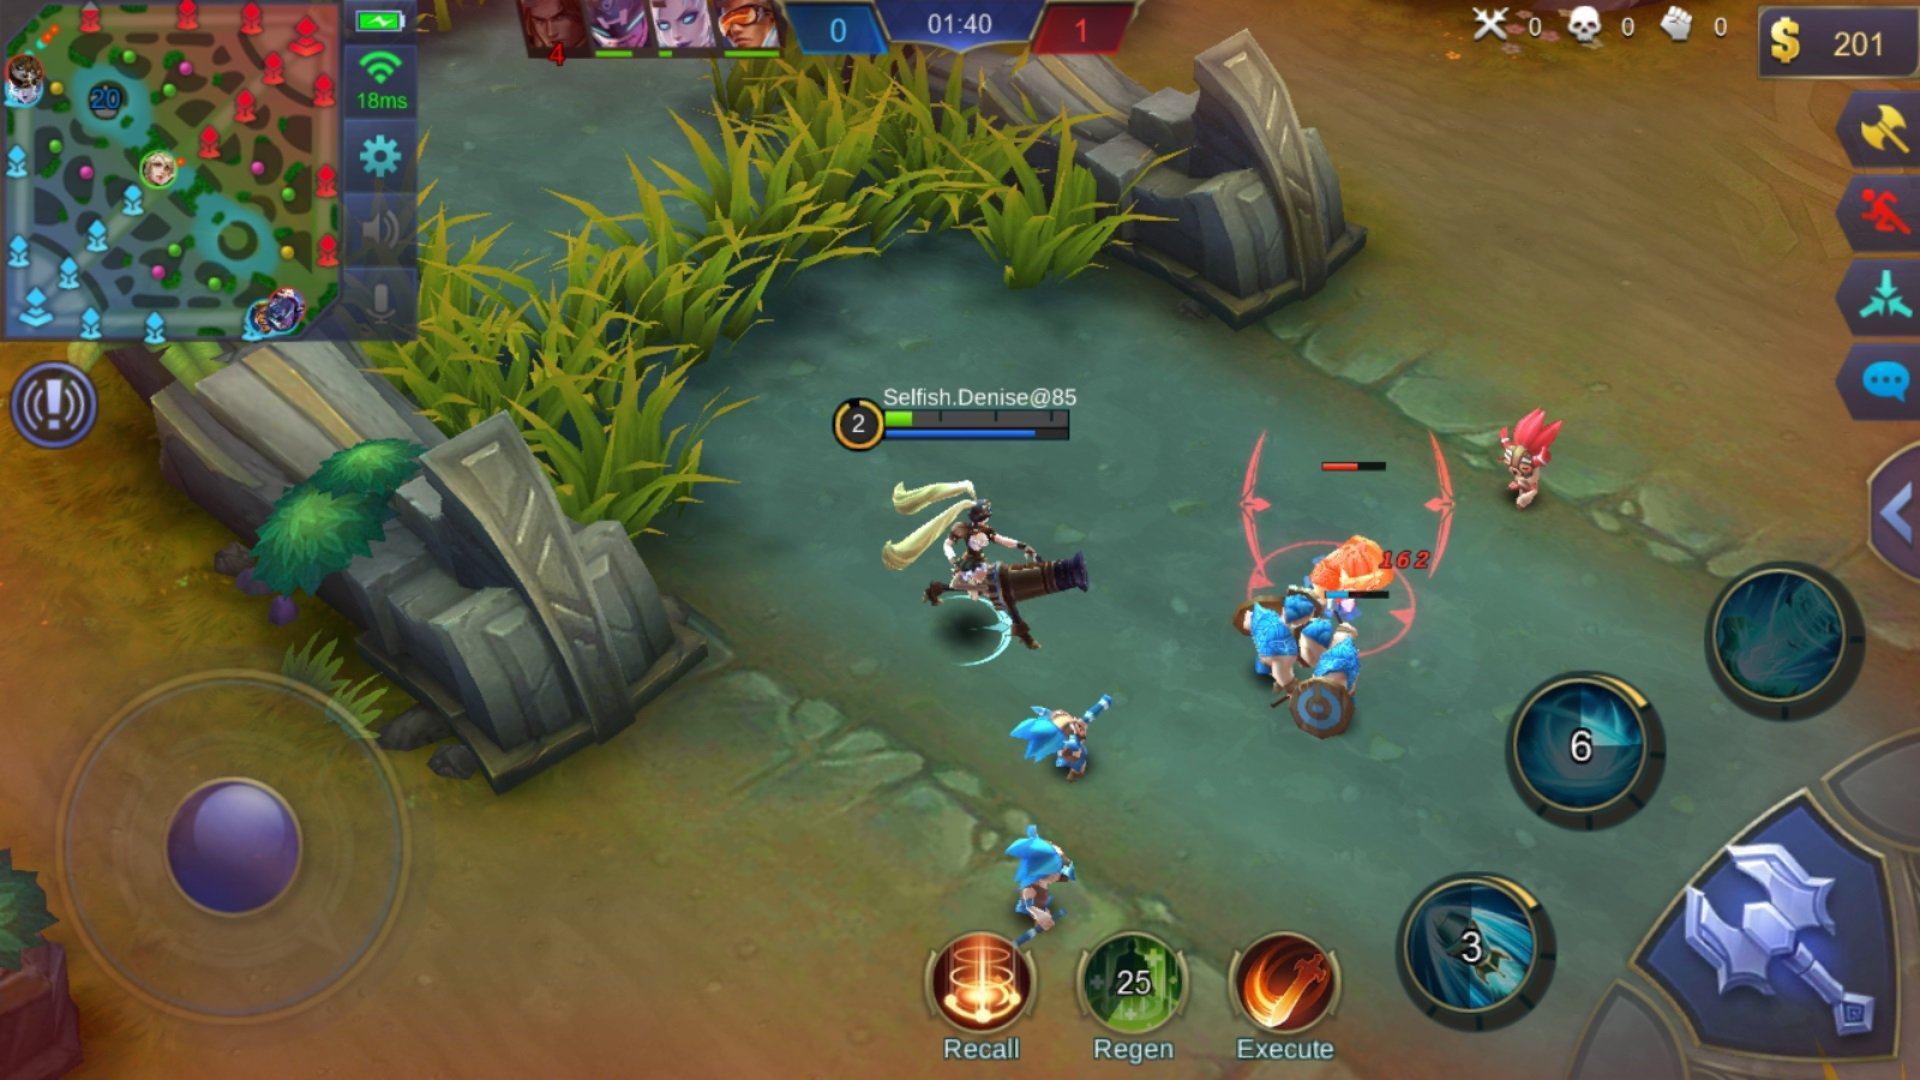 مزايا لعب Mobile Legends: Bang Bang على Bluestacks